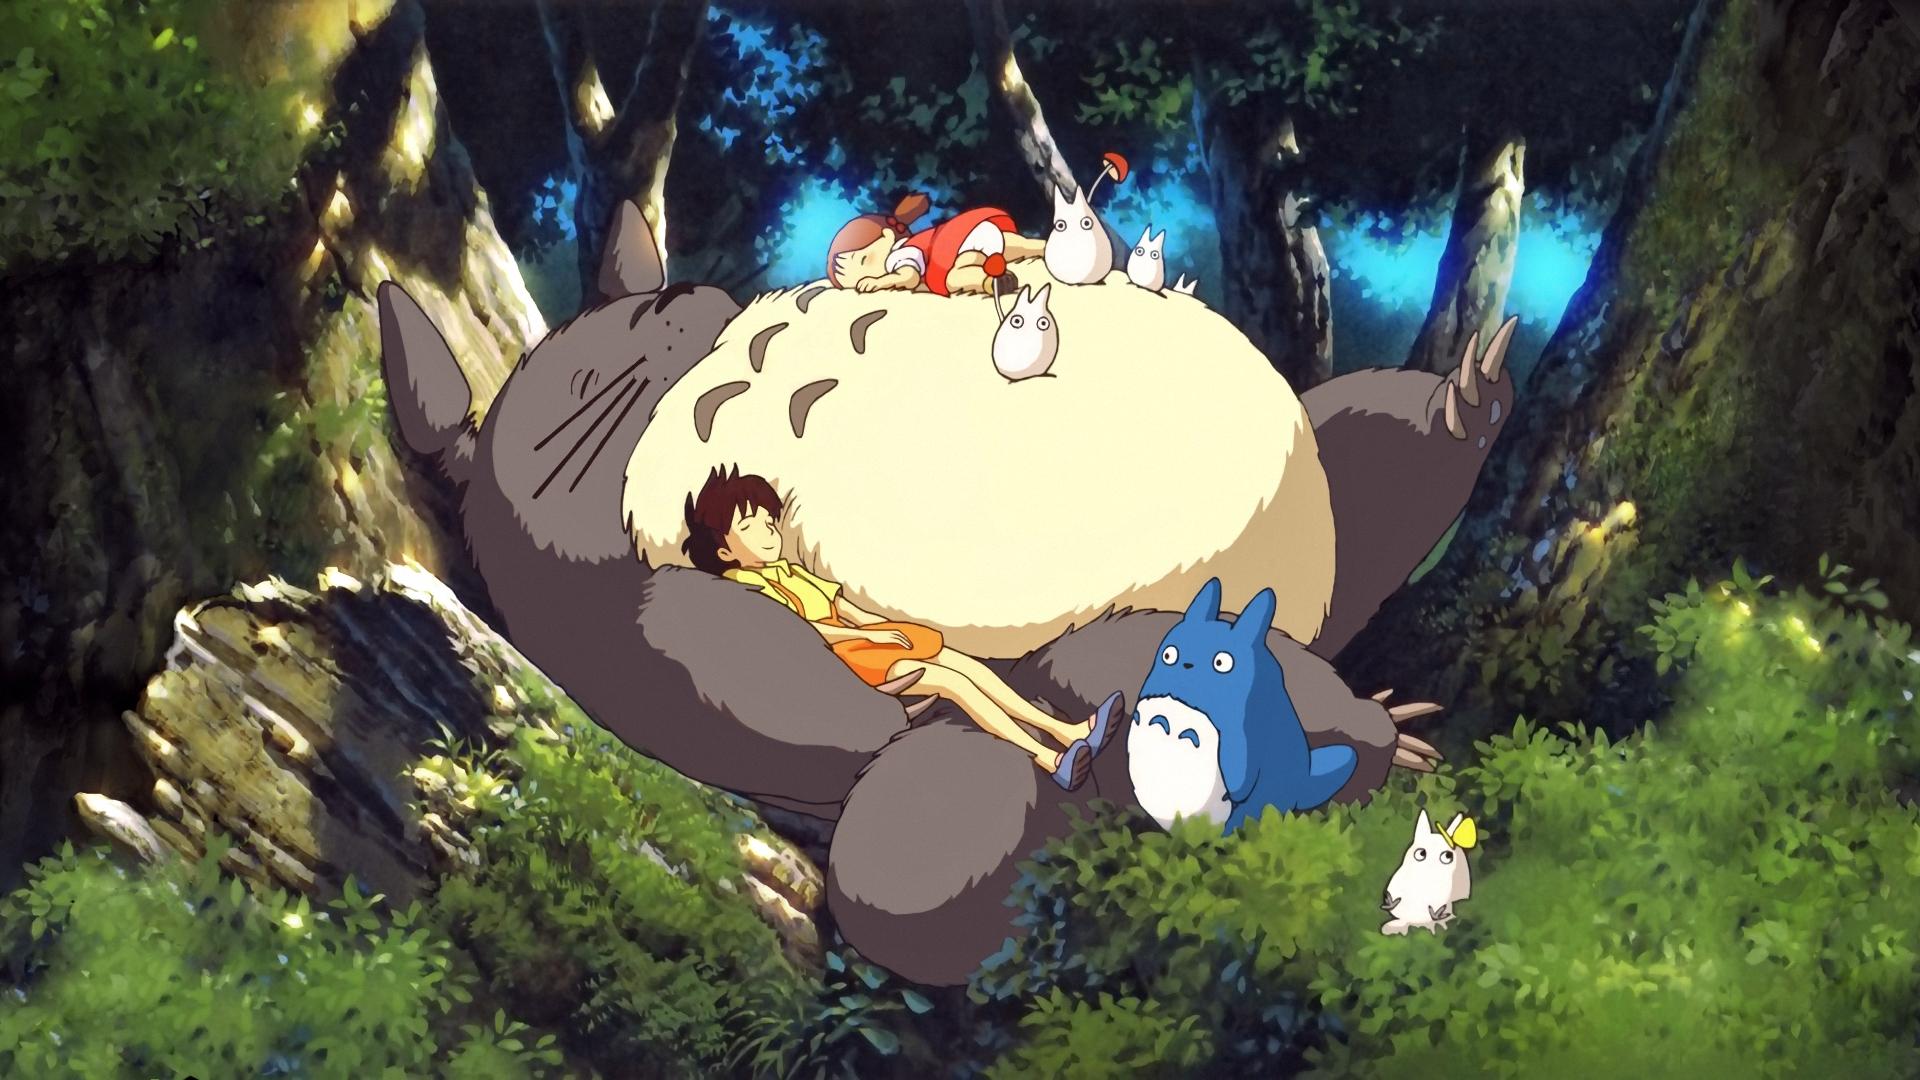 hayao miyazaki totoro 1920x1080 wallpaper_www.miscellaneoushi.com_3.jpg